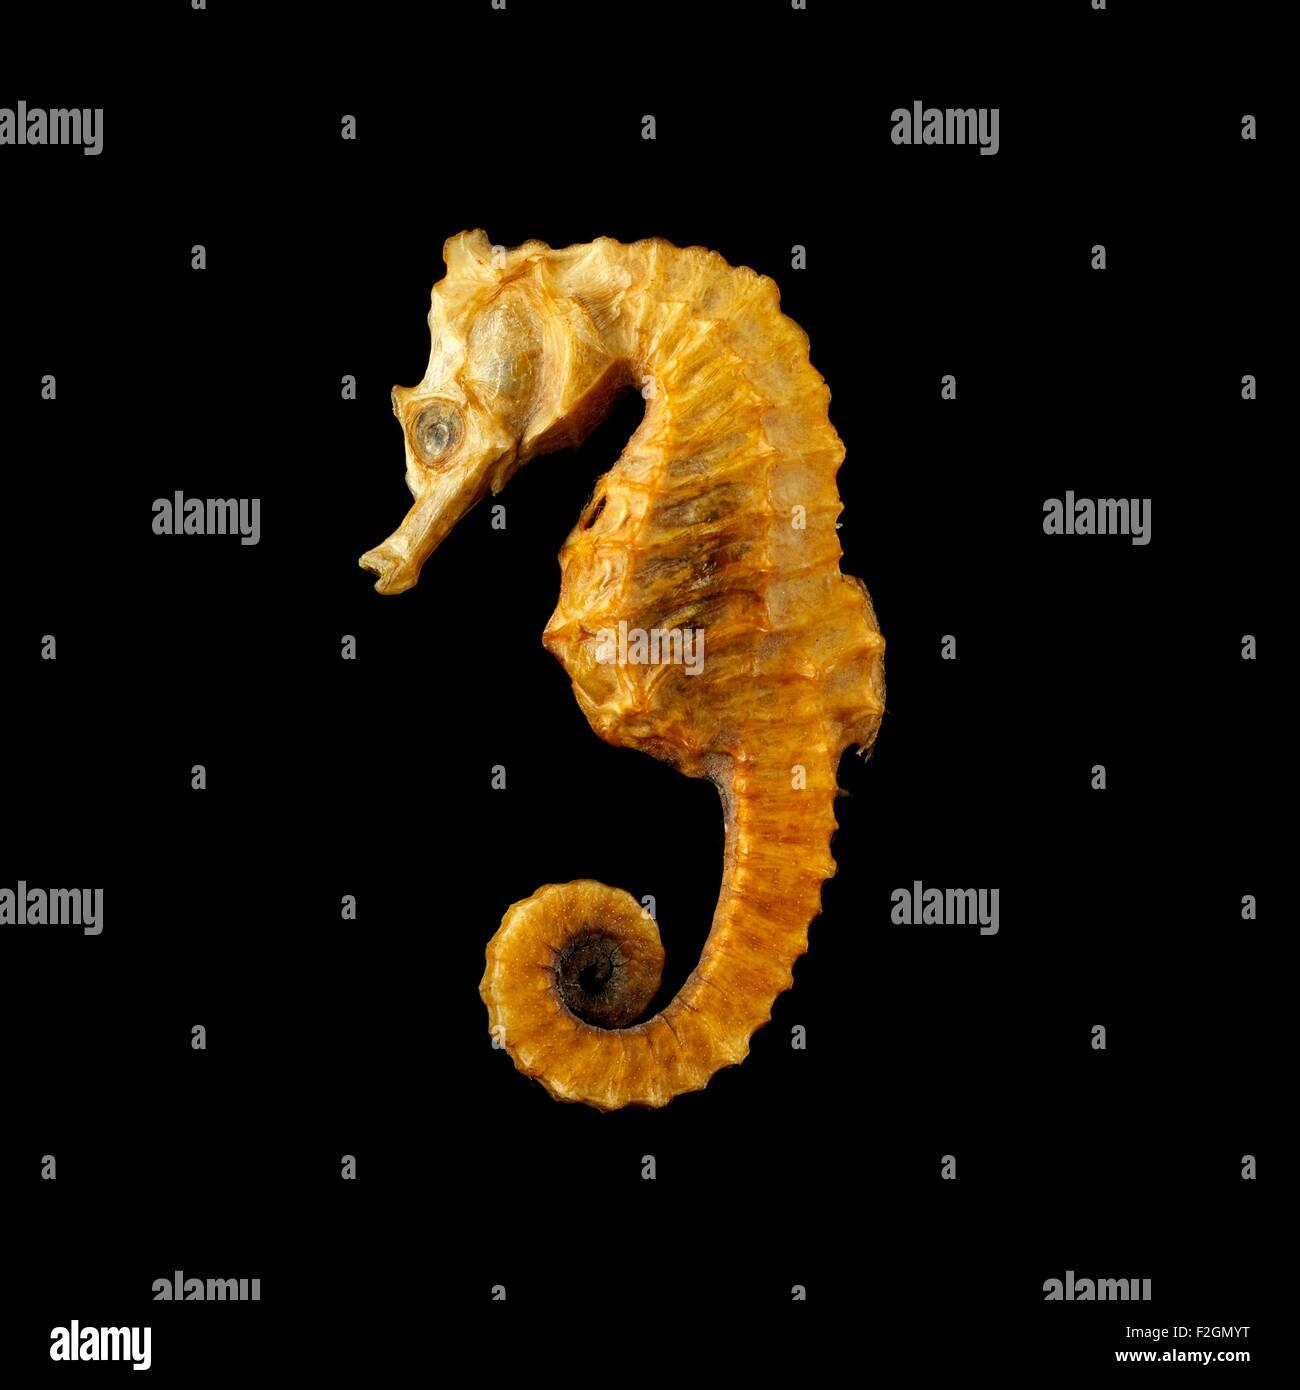 Seahorse against black background - Stock Image